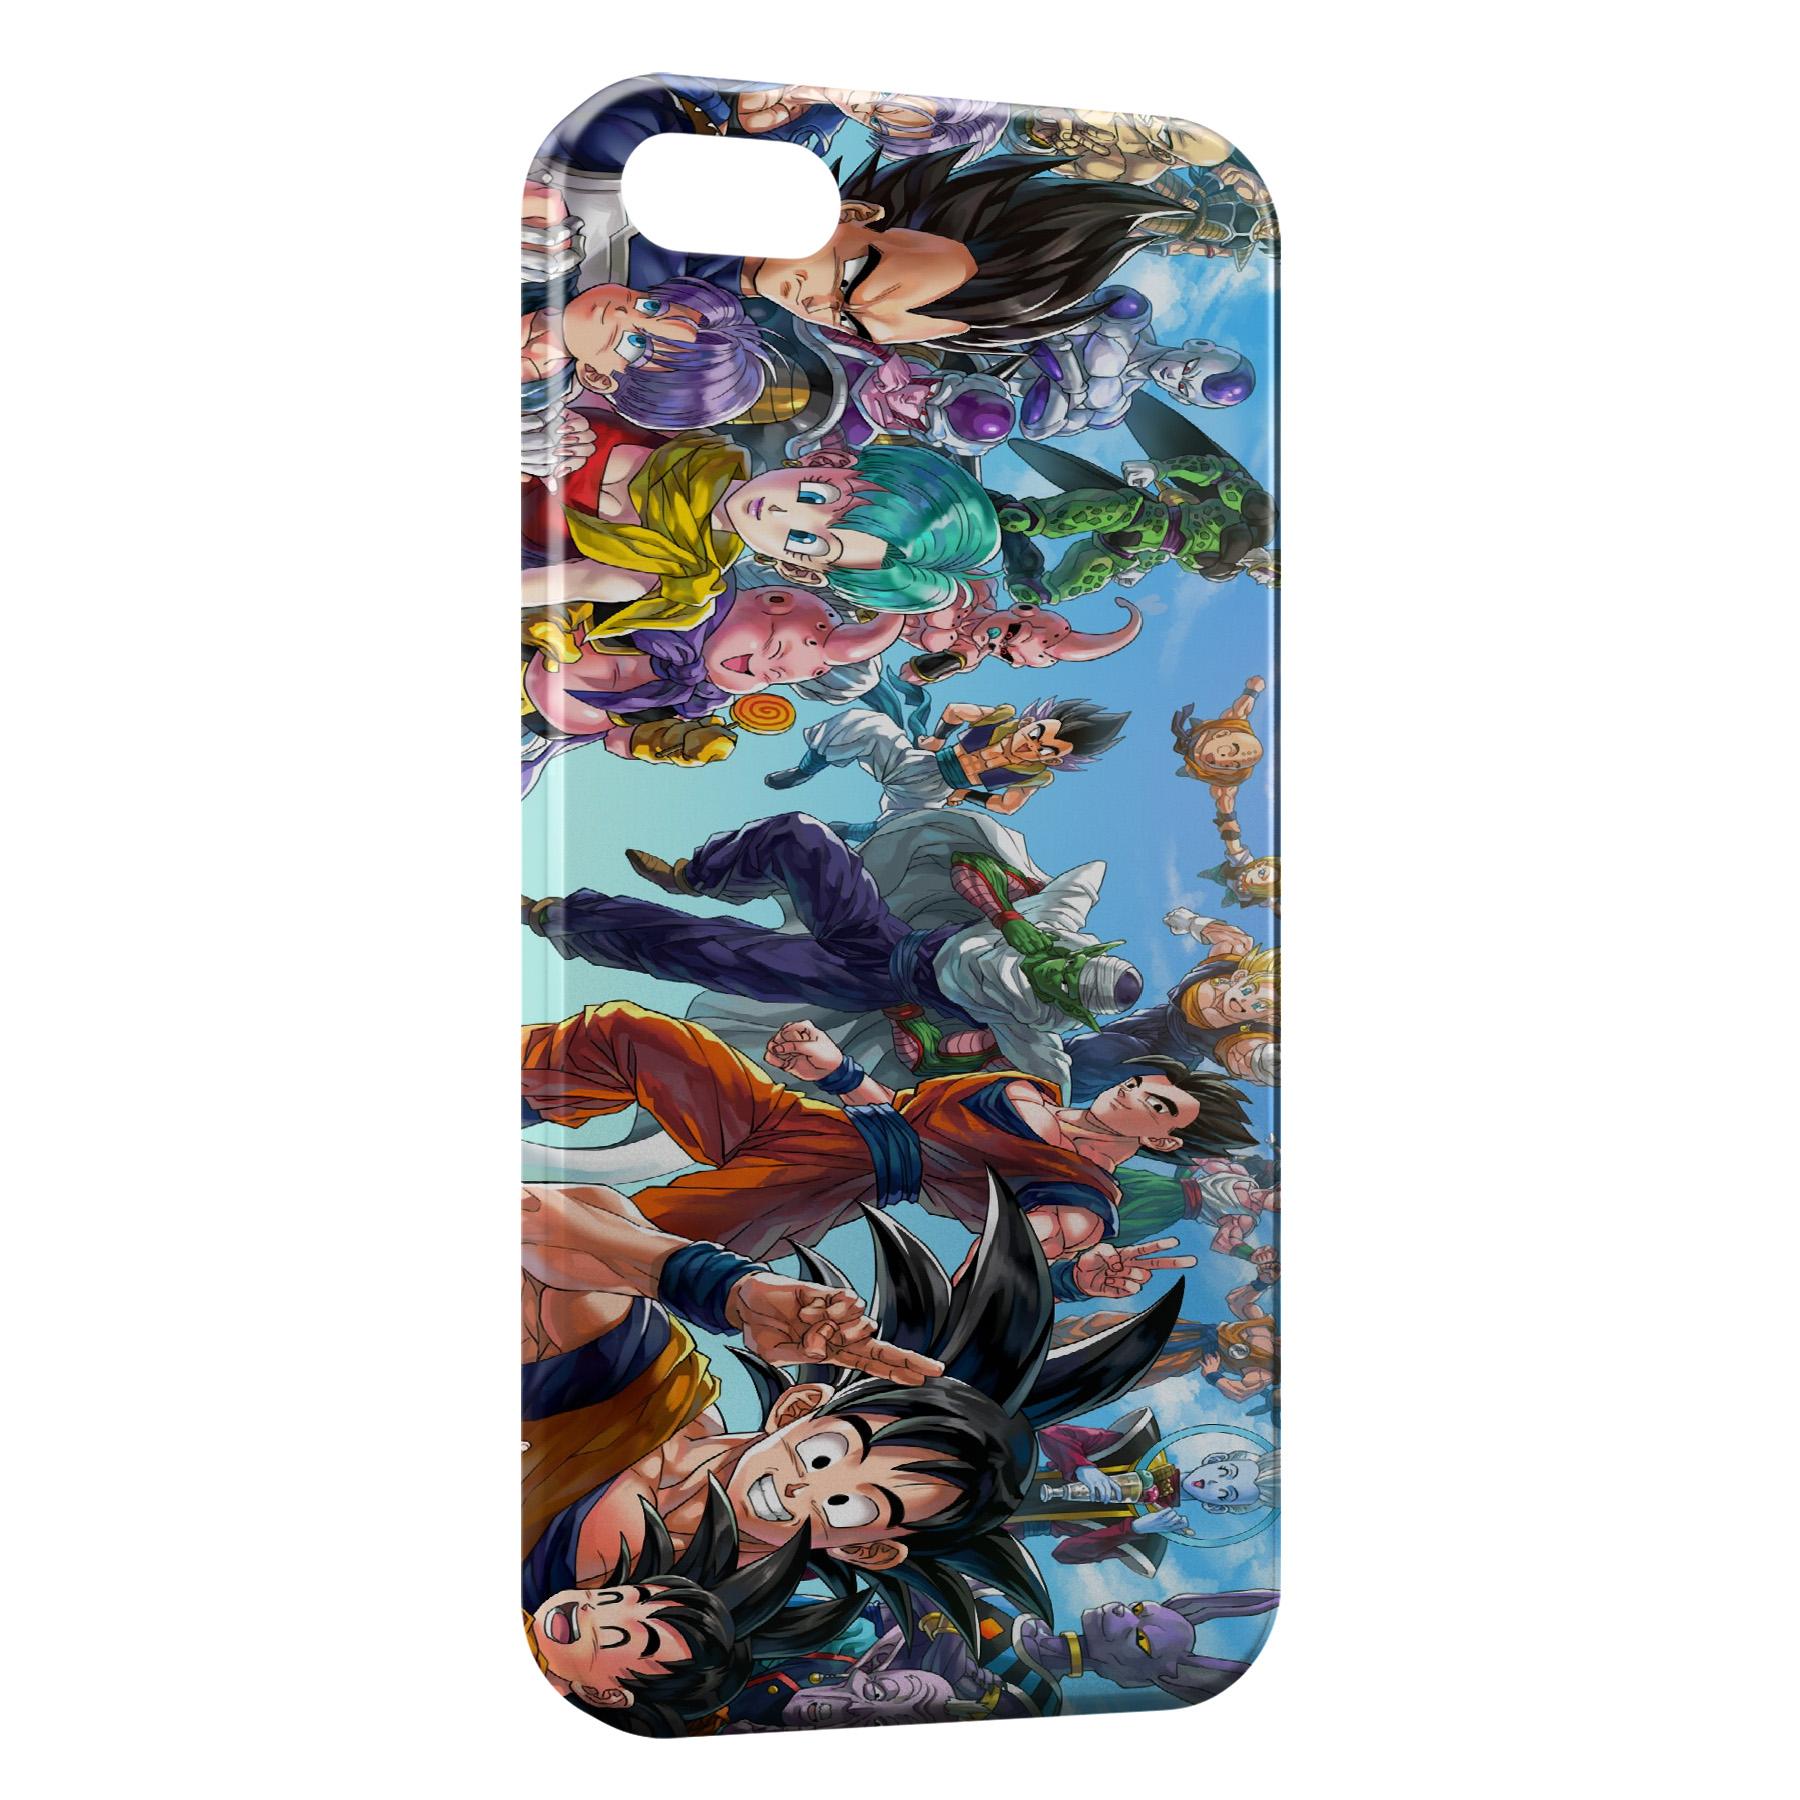 Coque iPhone 5C Dragon Ball Z Fashion Group